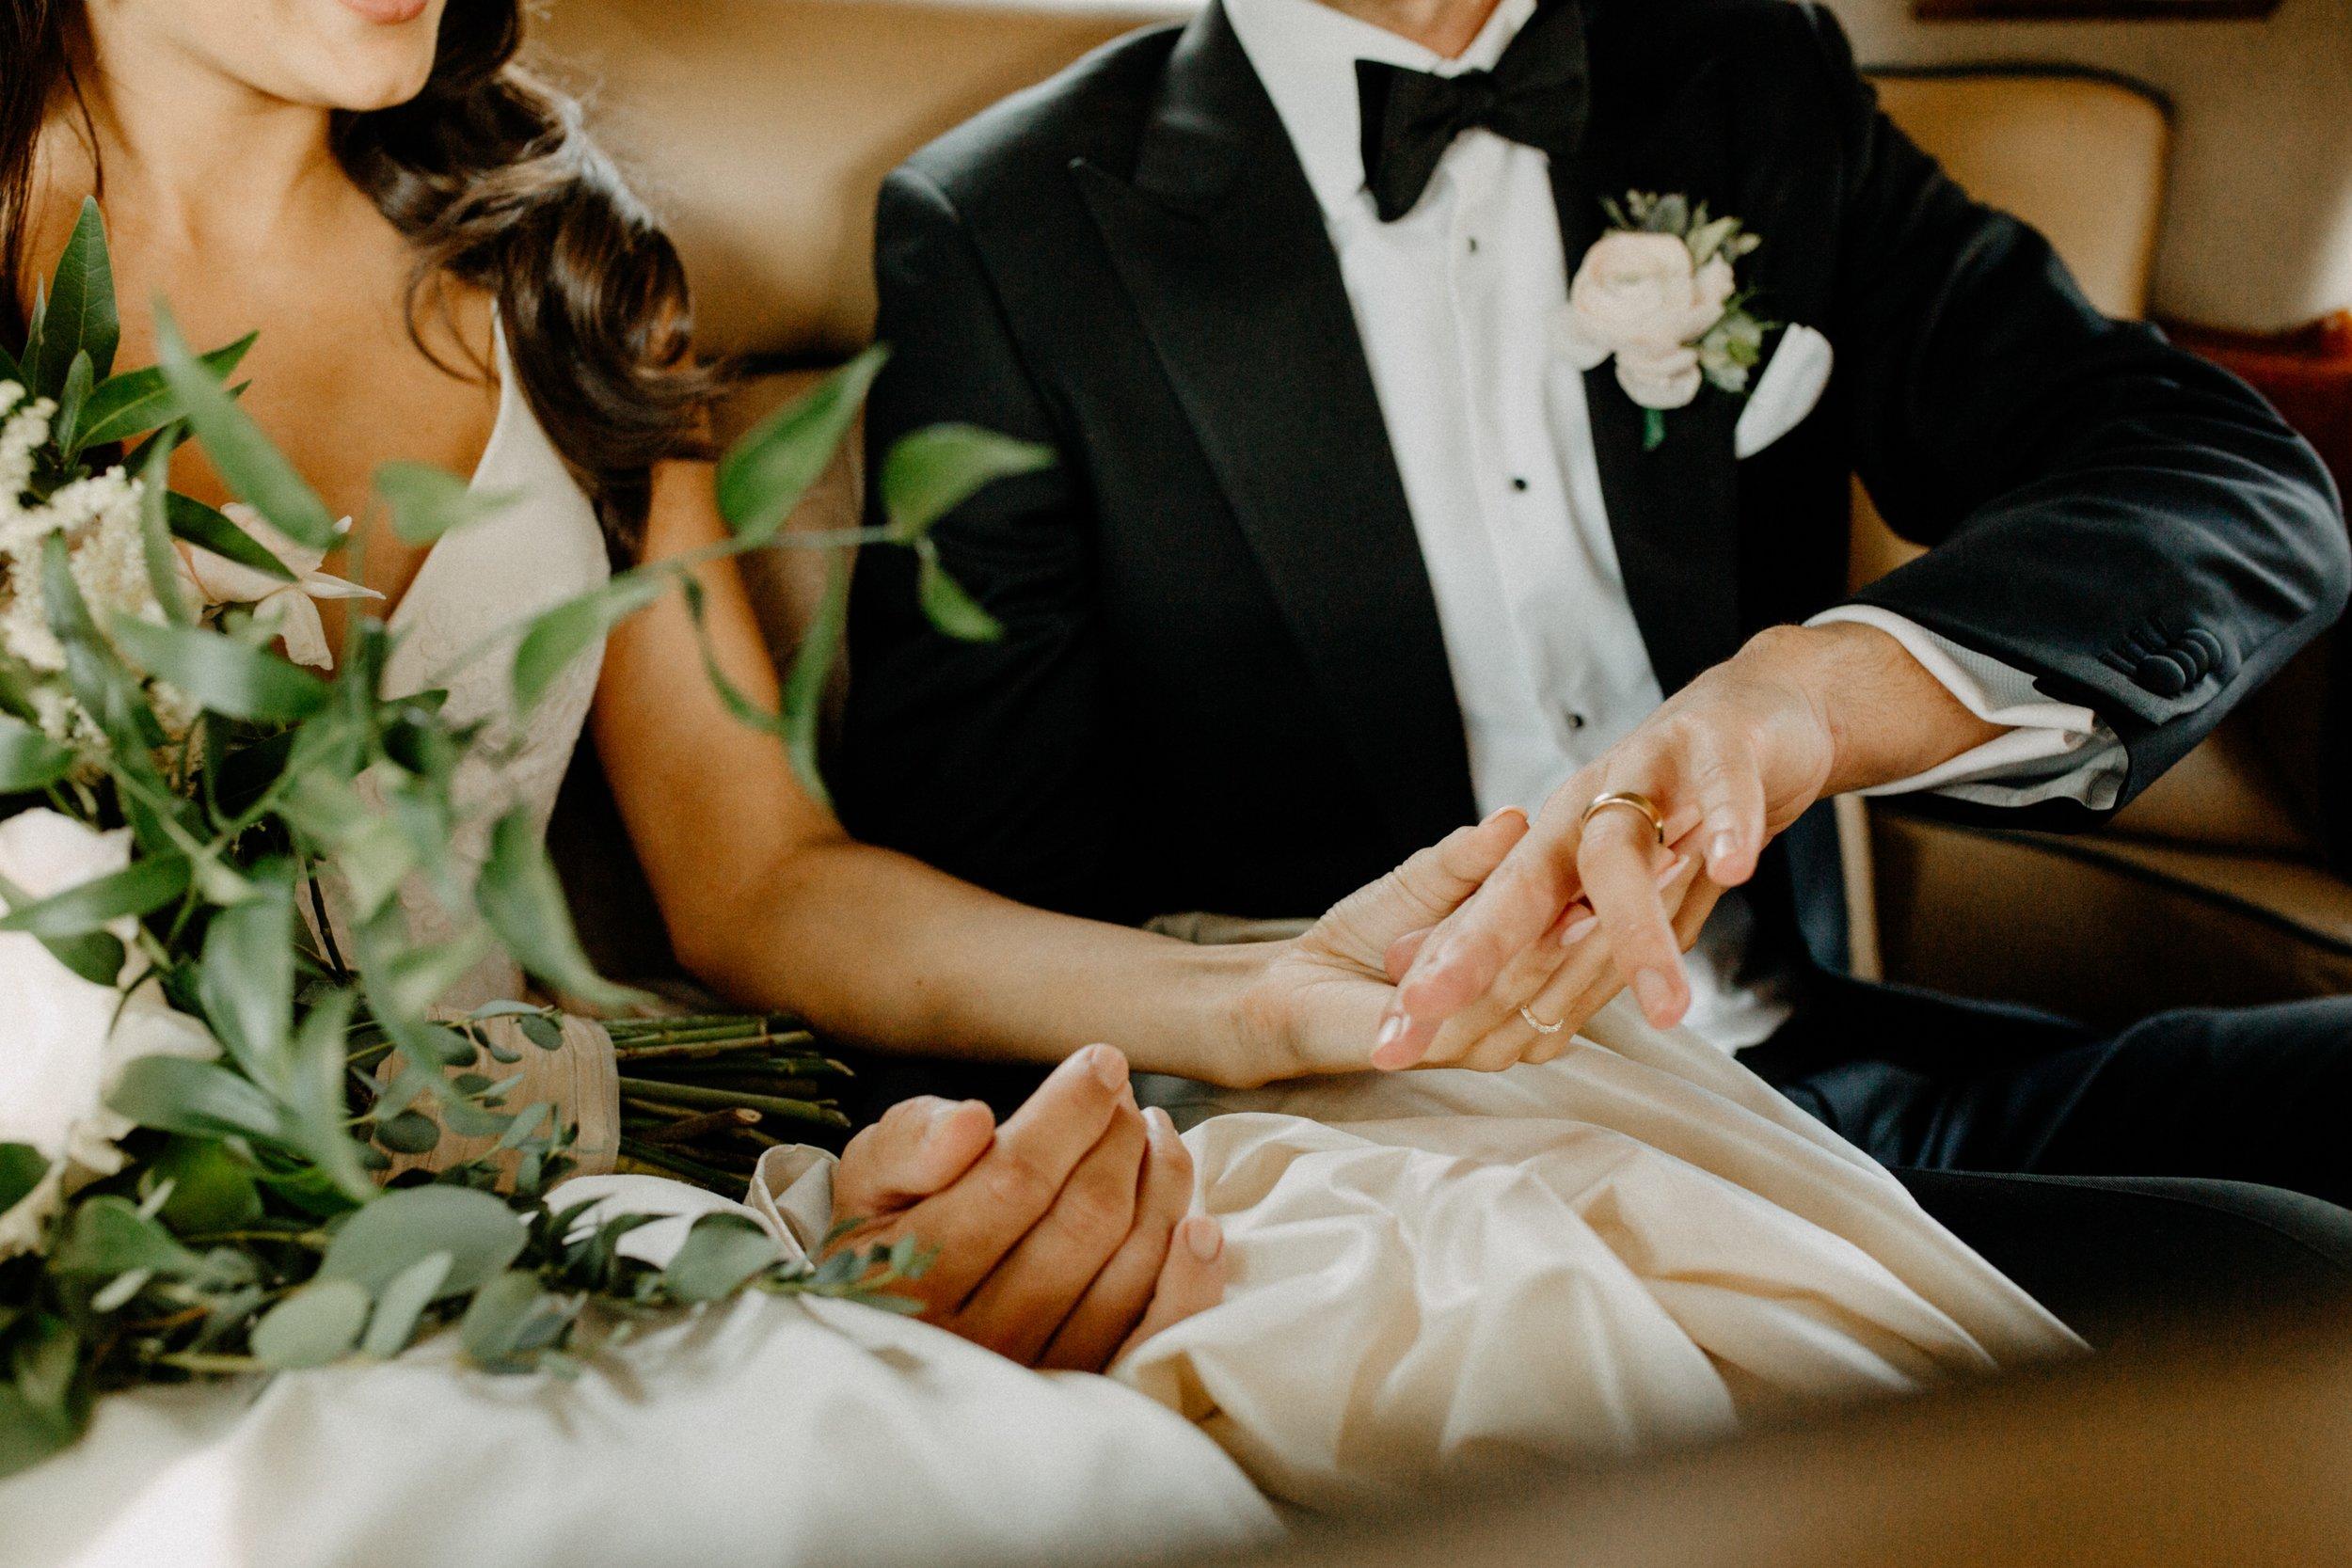 st-anthony-hotel-wedding-photography-10087san-antonio.JPG